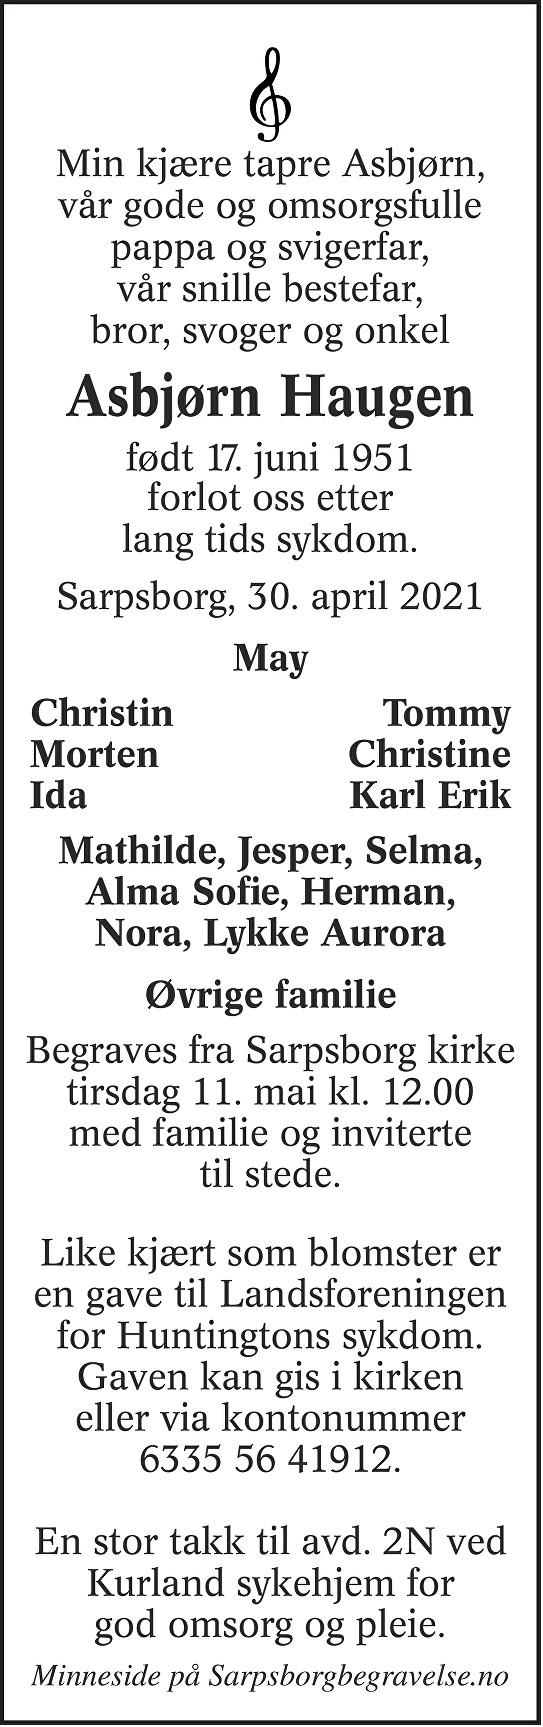 Asbjørn Haugen Dødsannonse